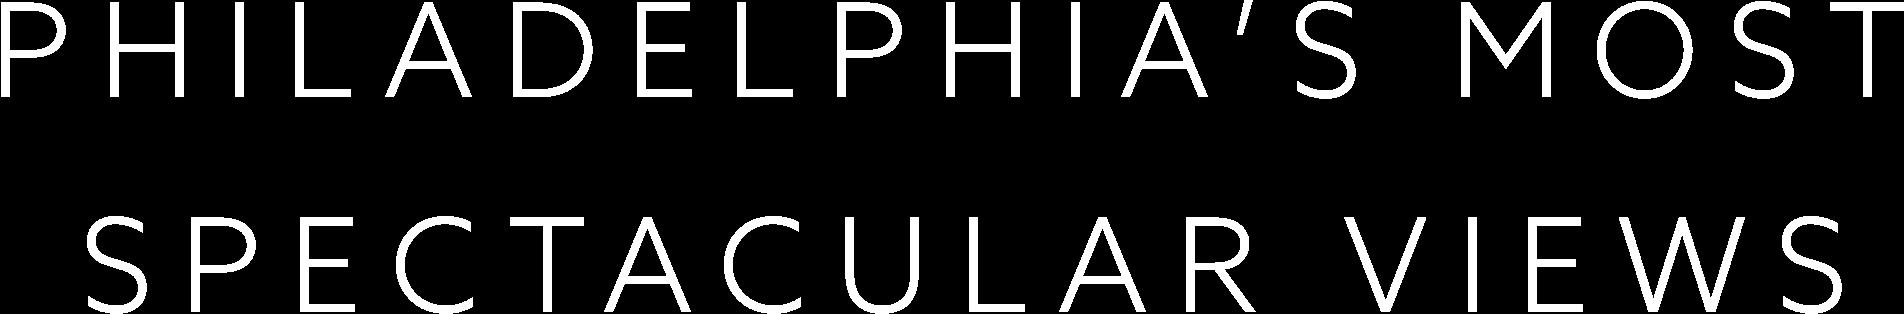 header-copy_philadelphia.png